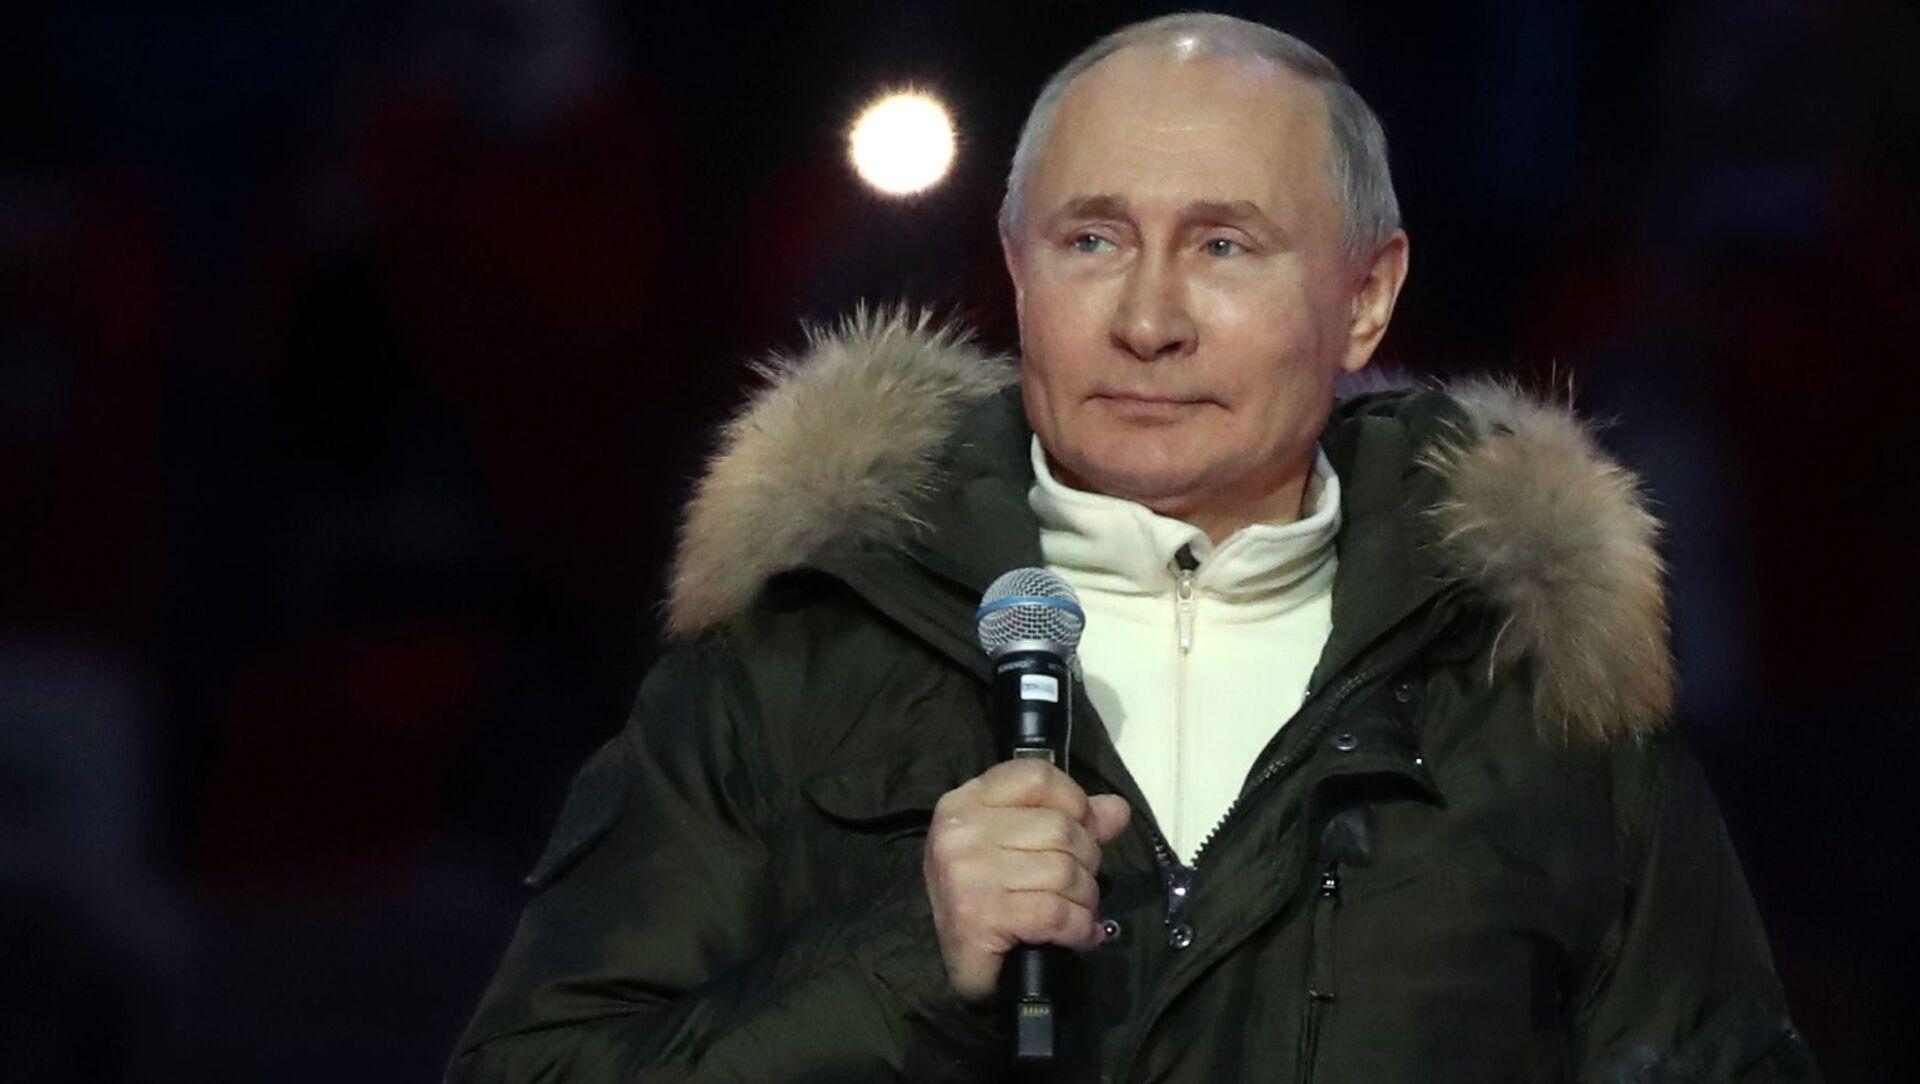 Władimir Putin - Sputnik Polska, 1920, 22.03.2021